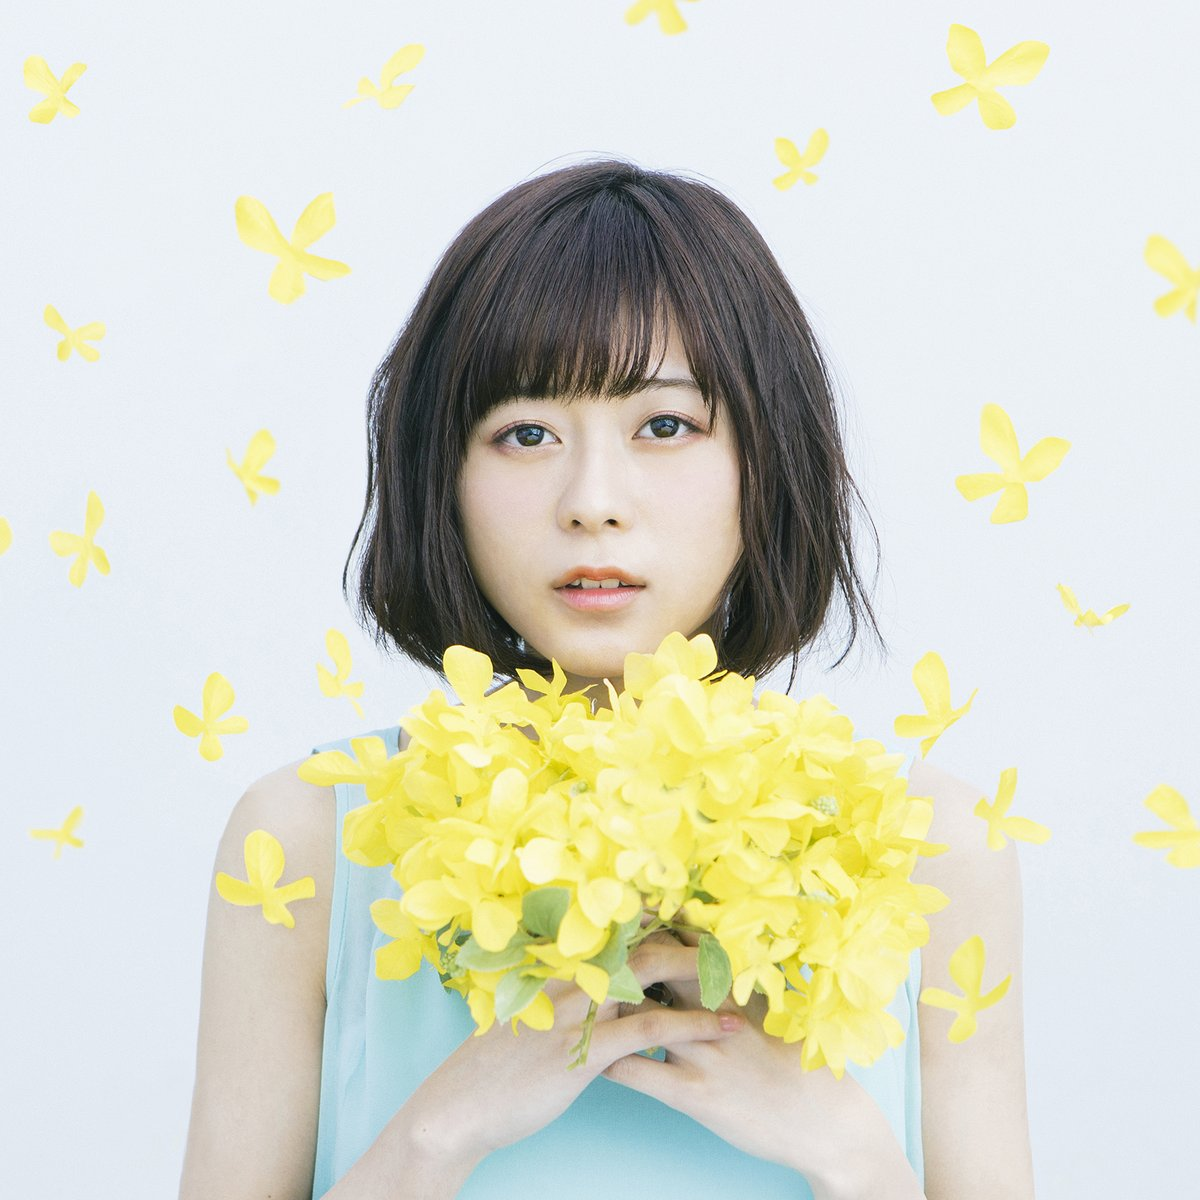 20170516.2203.3 Inori Minase - Innocent Flower cover 1.jpg